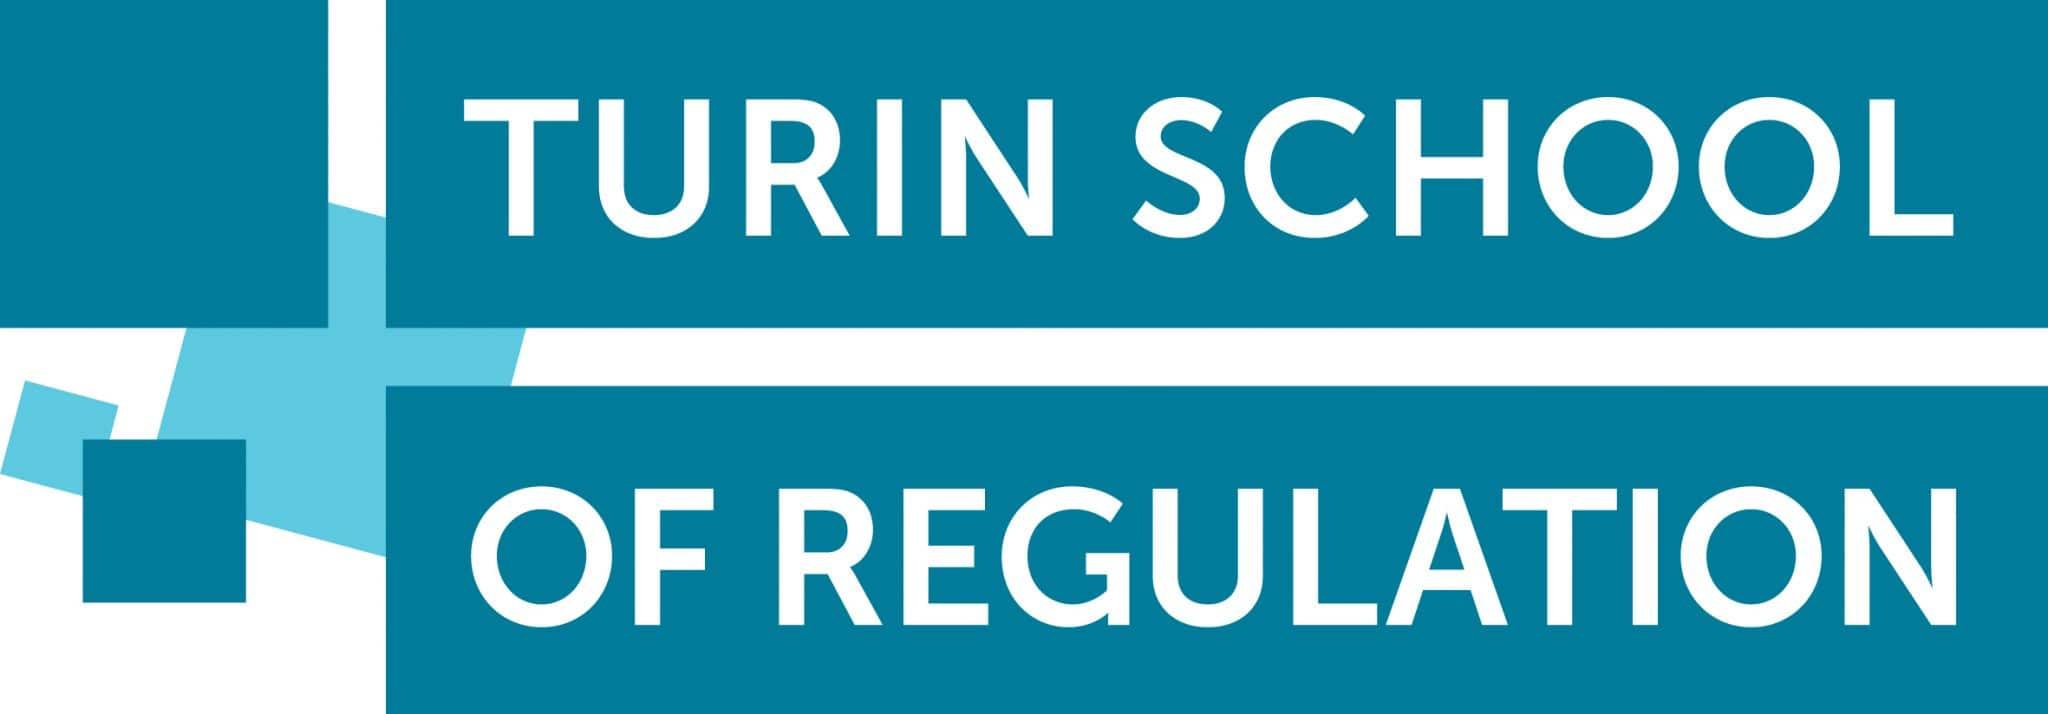 Turin School Logo